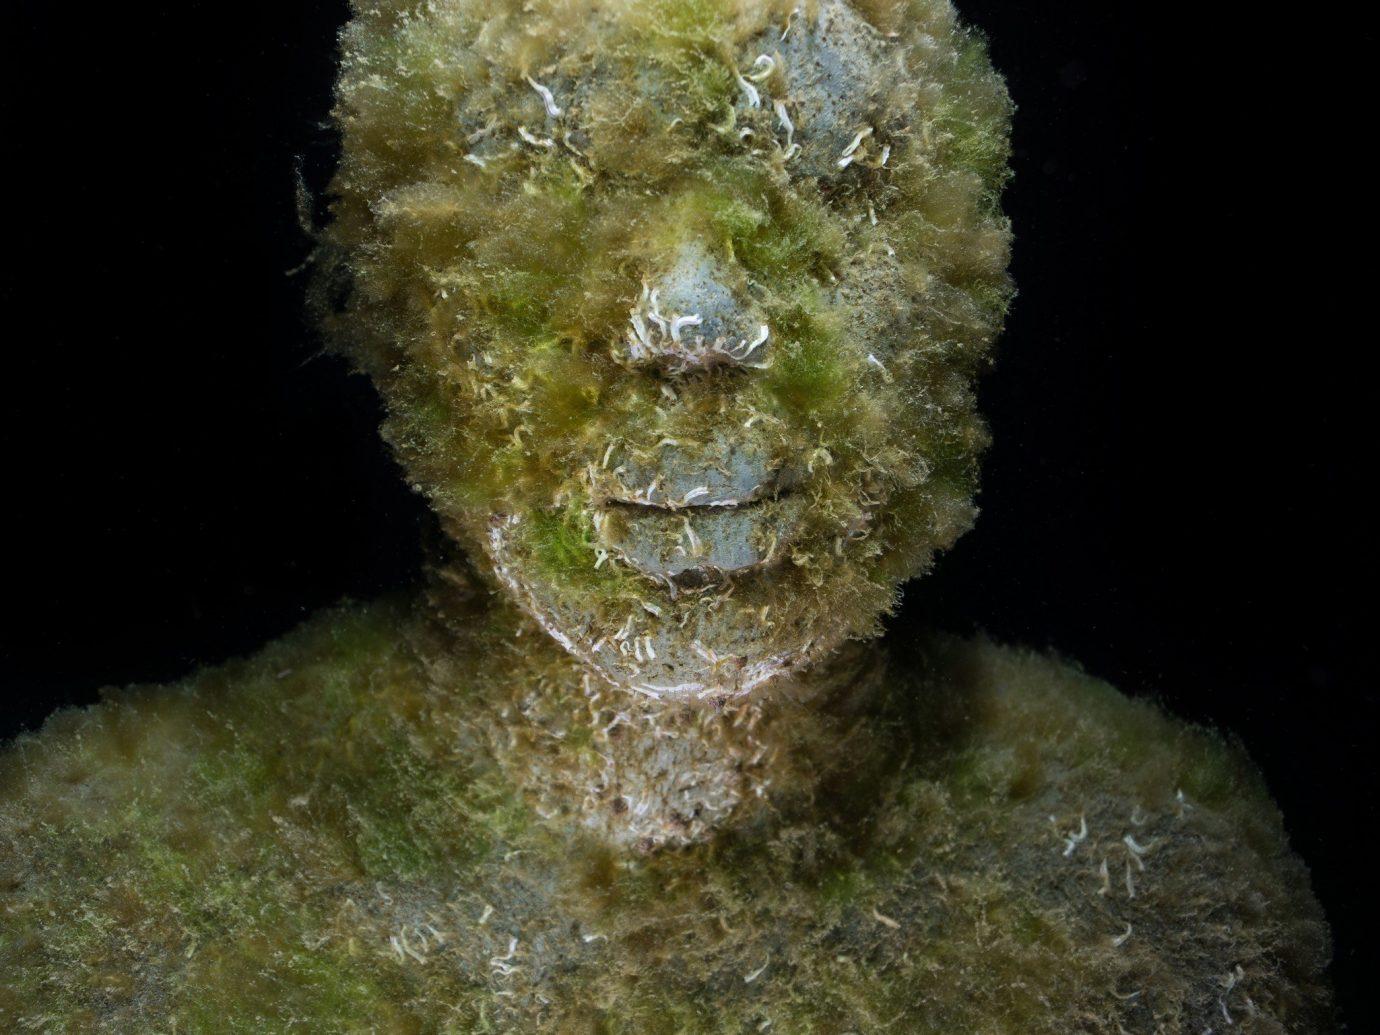 Arts + Culture Offbeat Scuba Diving + Snorkeling Trip Ideas sculpture head art ancient history statue formation close ocean floor